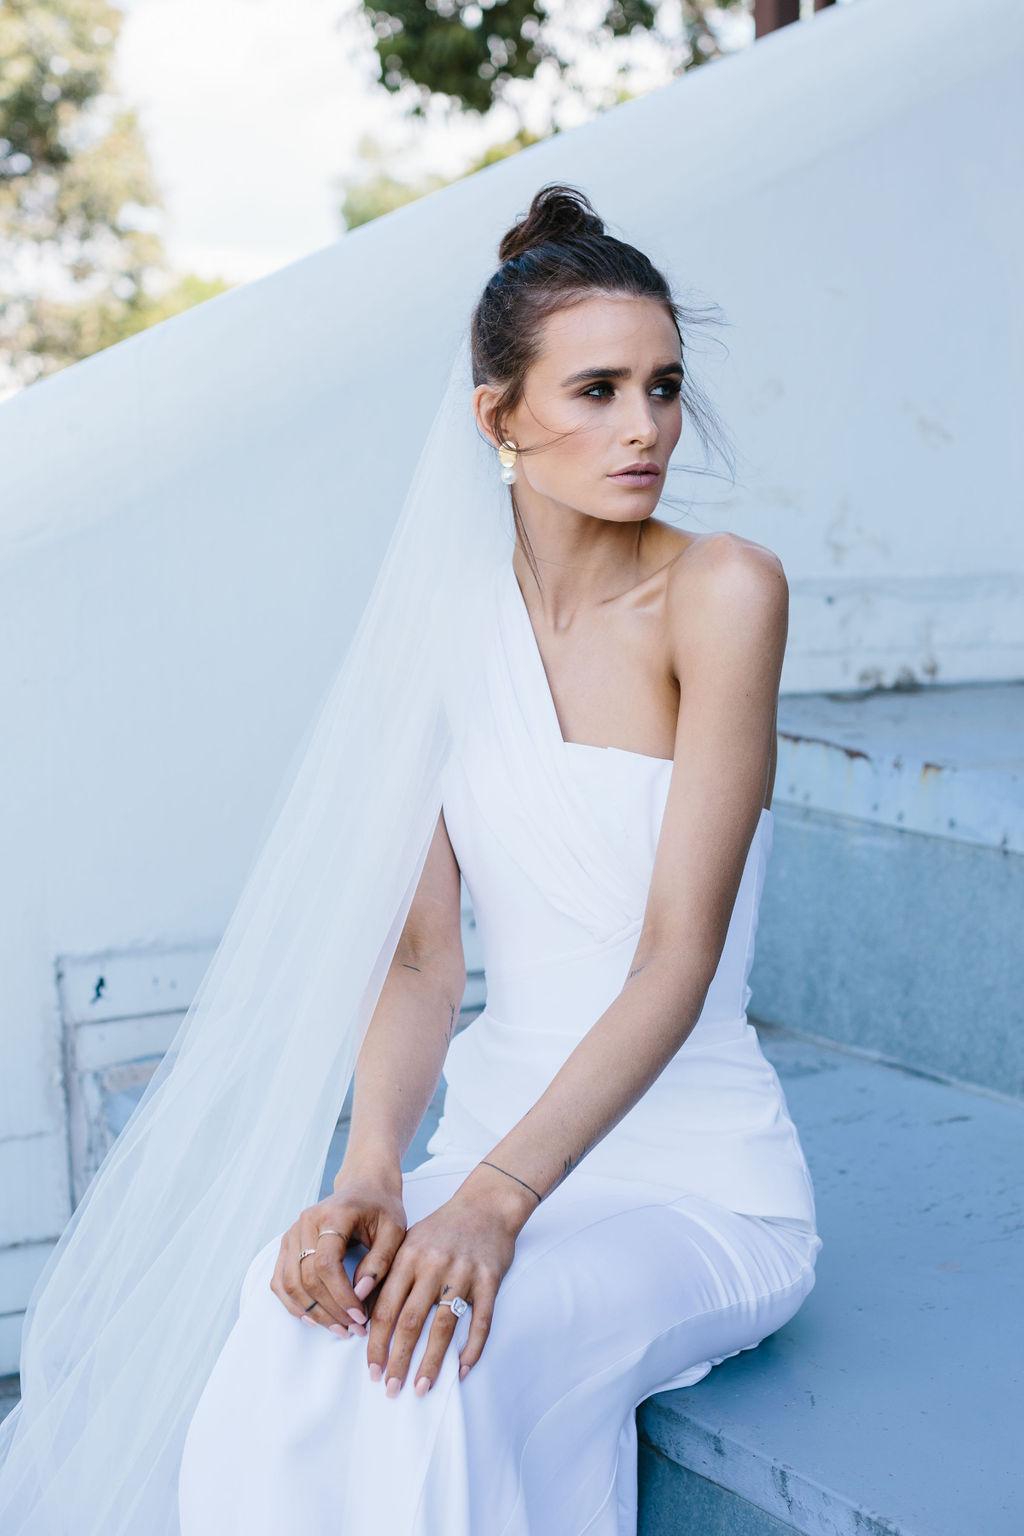 bridal-and-wedding-earrings-kallista-gold-pearl-drop-bridal-earrings-7.jpg